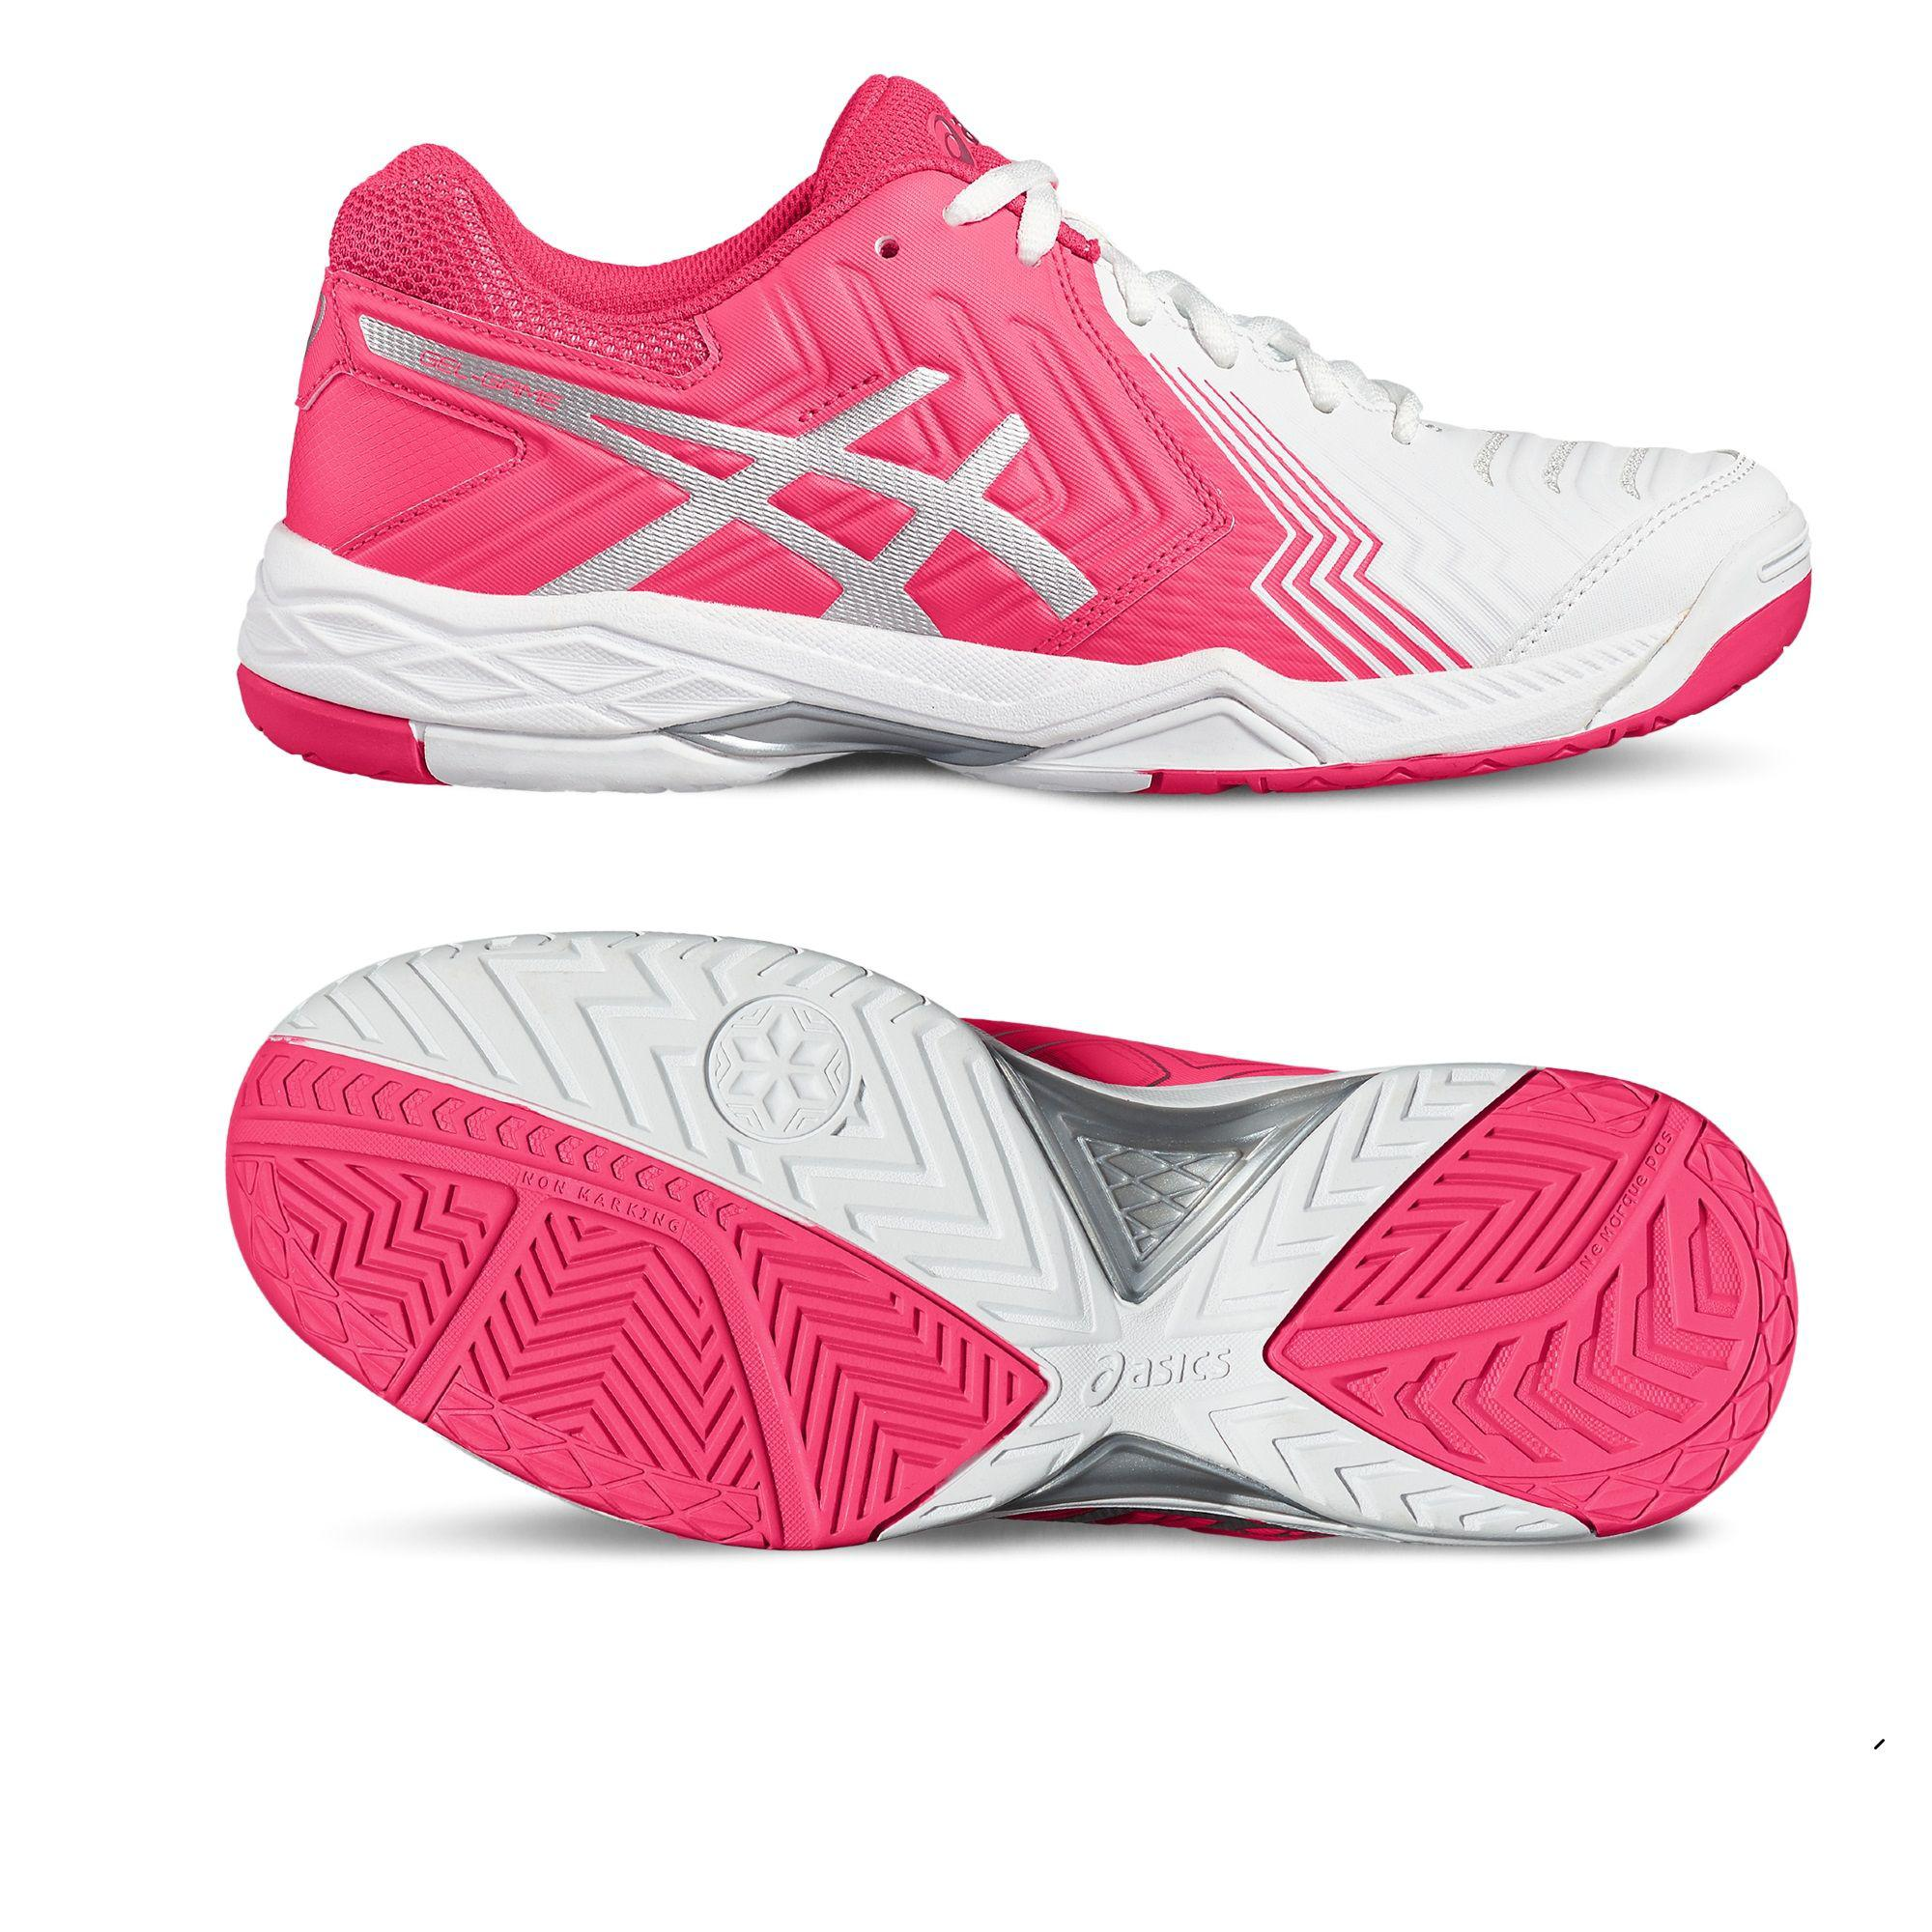 Asics Gel Game 6 Womens Tennis Shoe, White/Silver, E755Y 0193